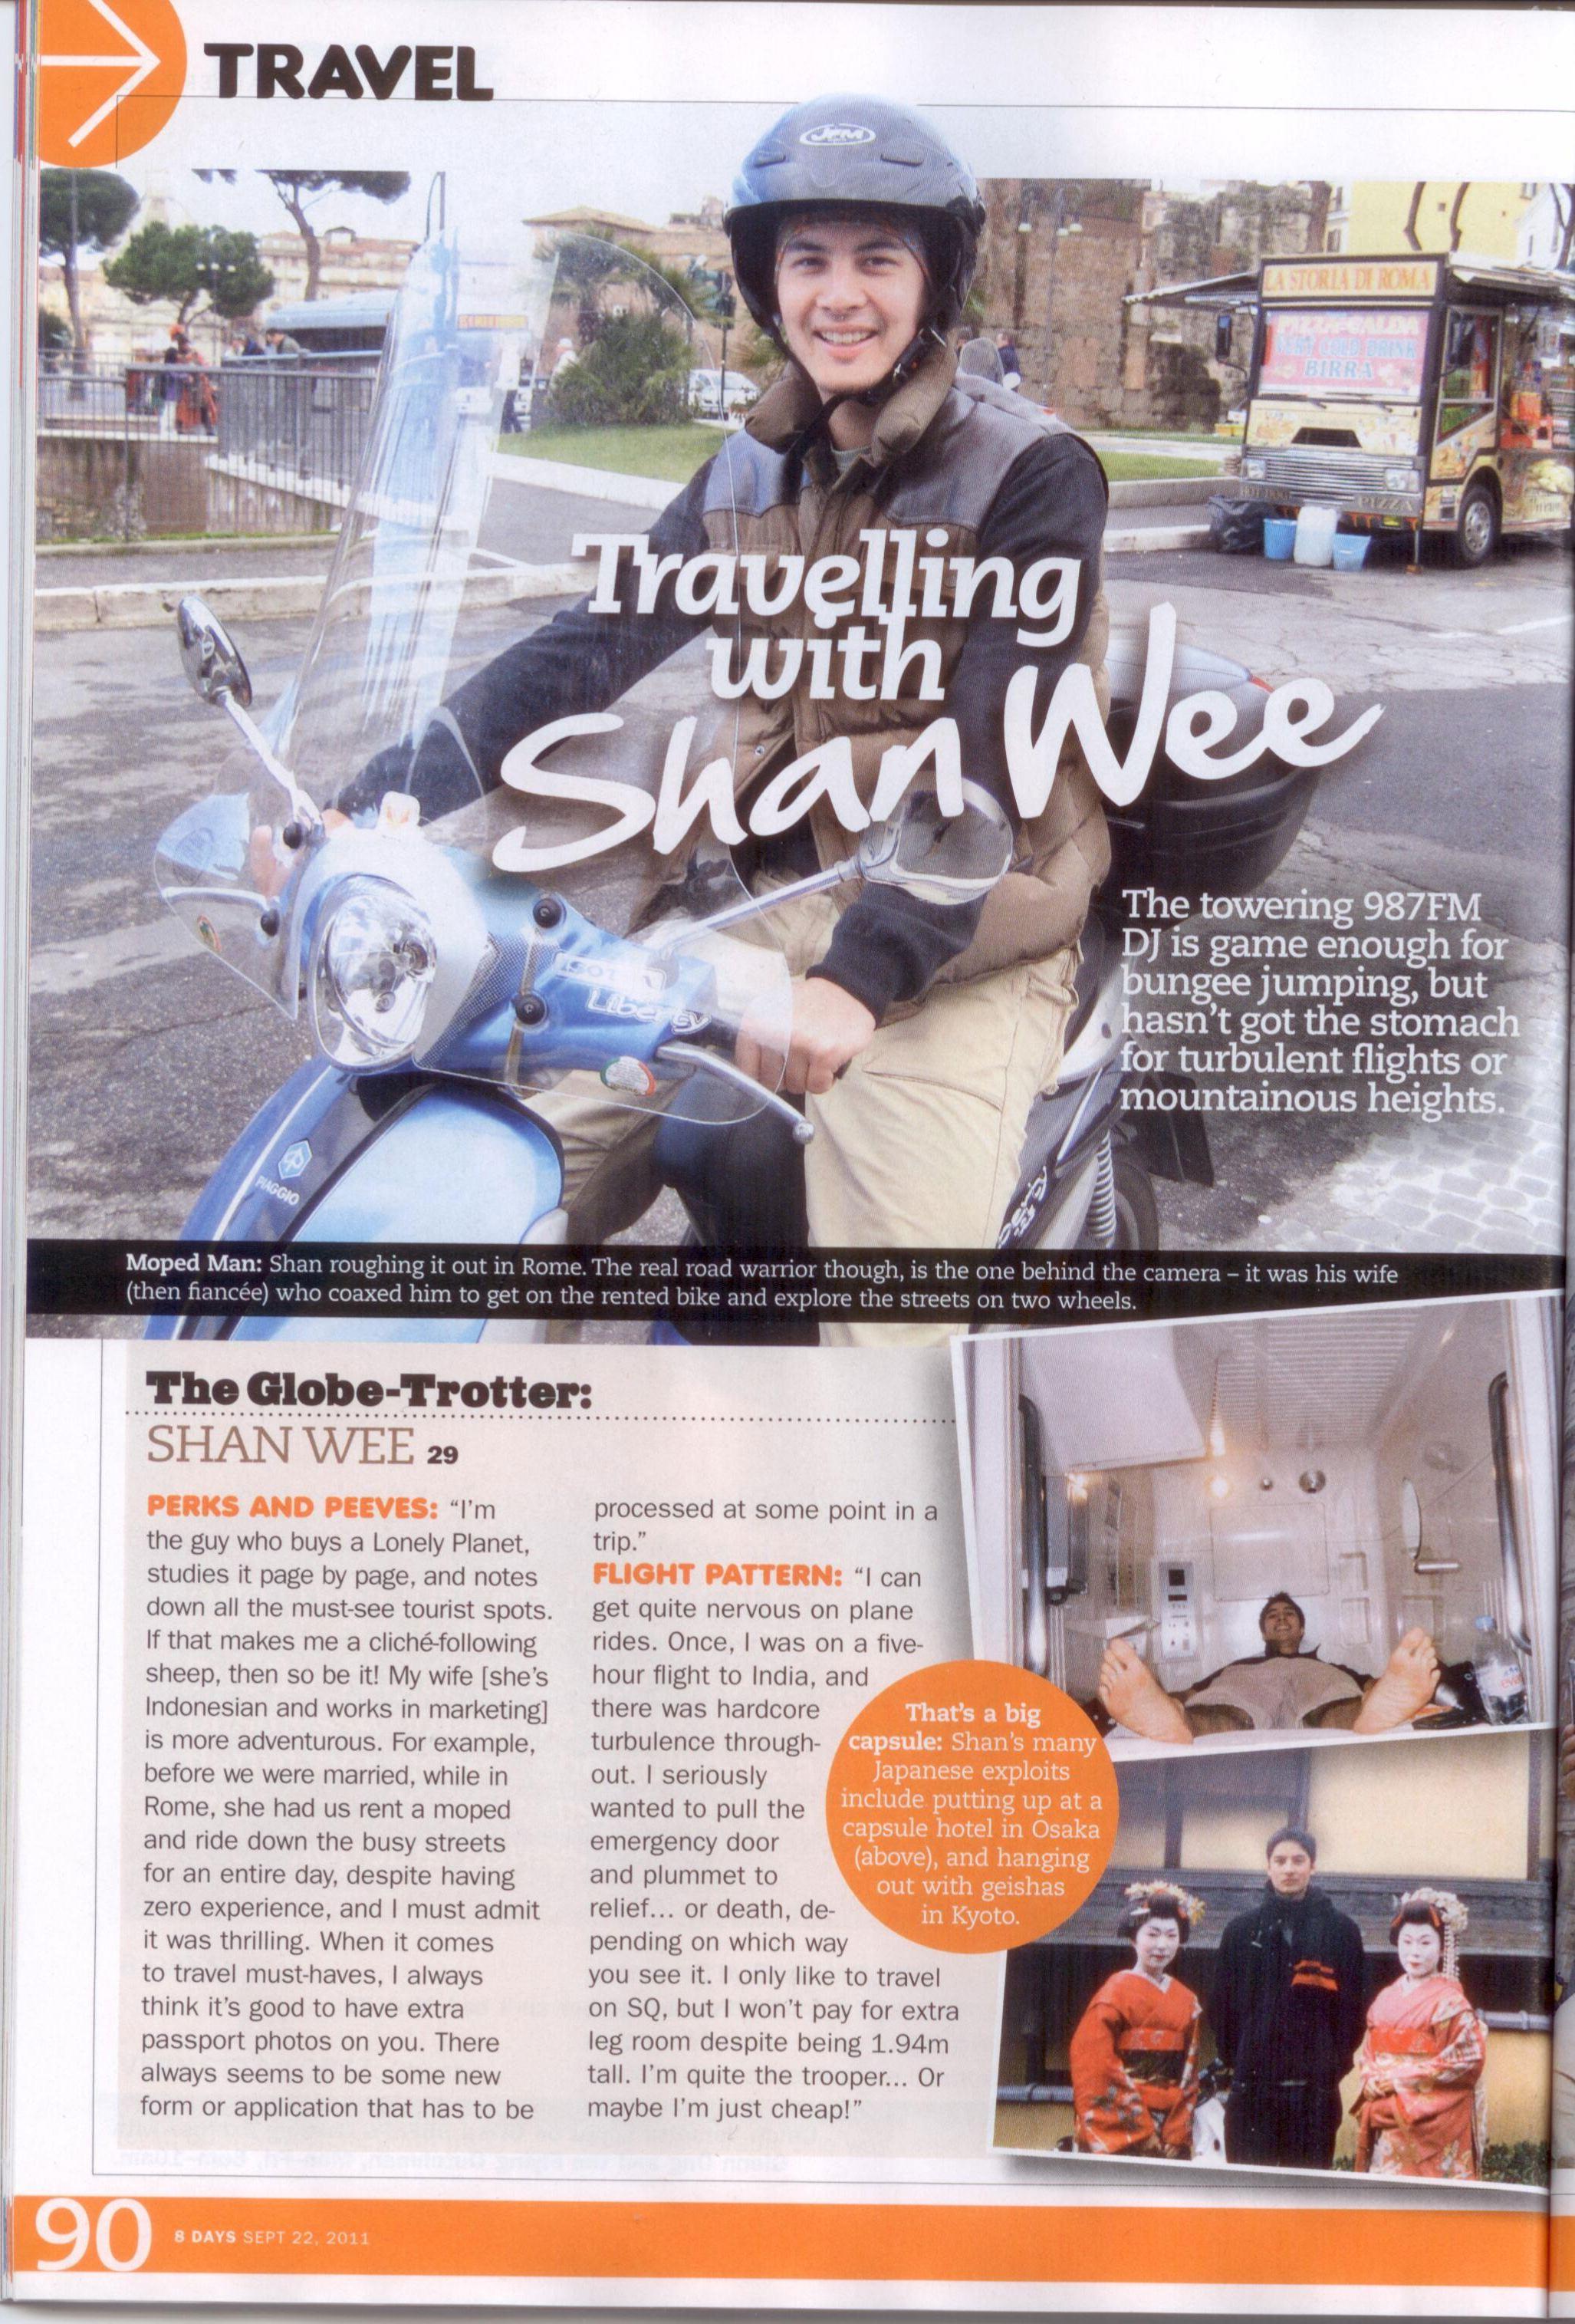 Moped Shan